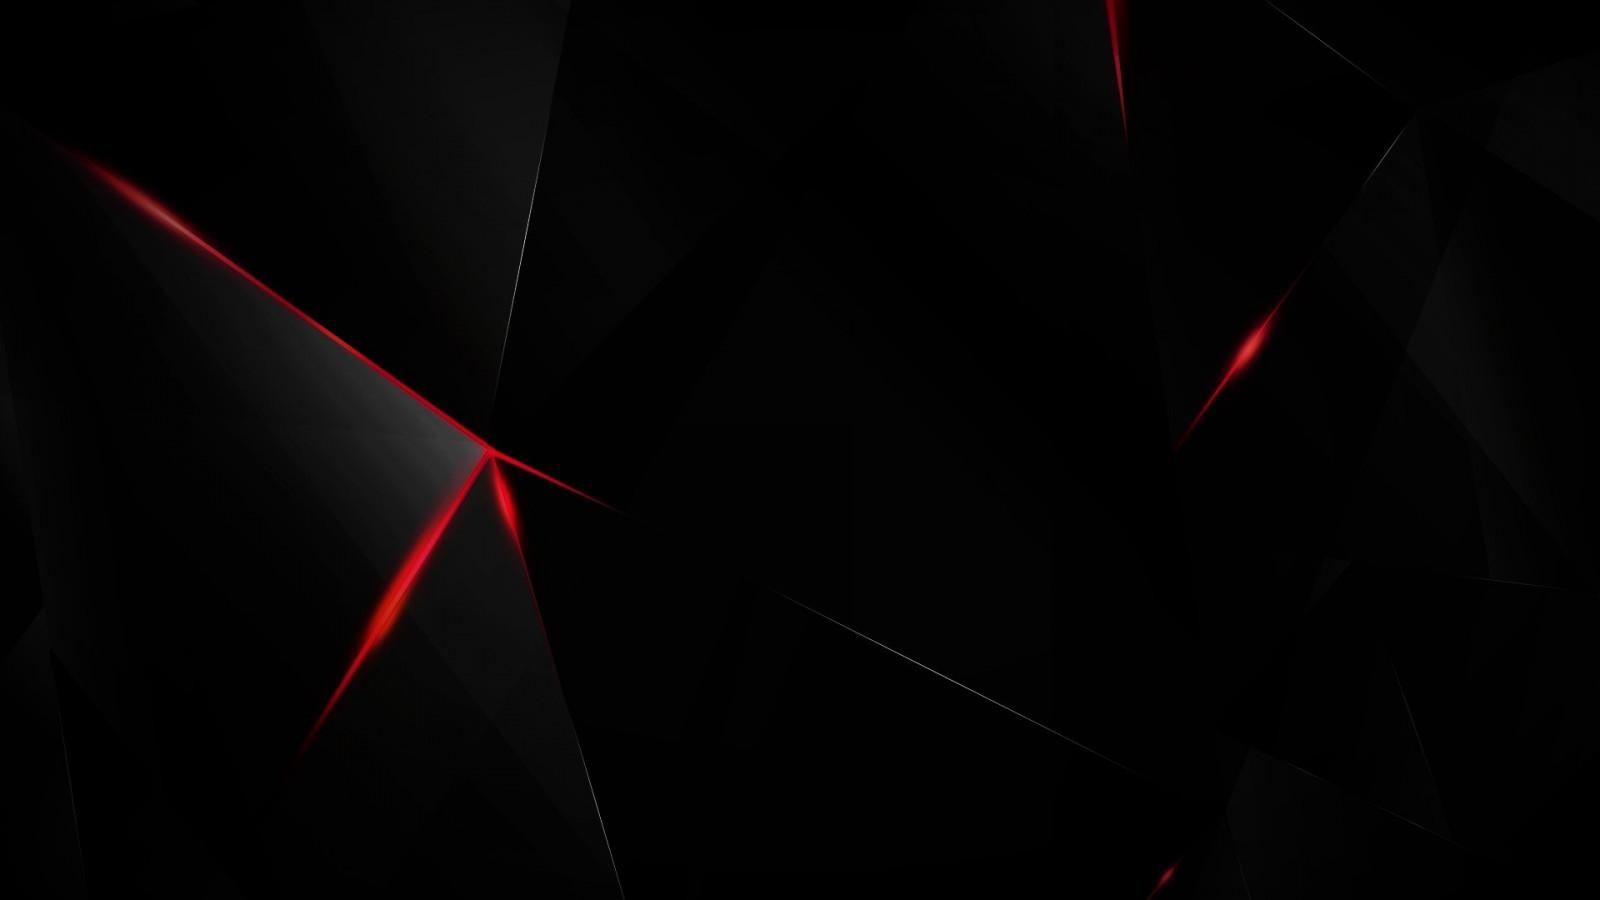 10 Top Black And Blue Shards Wallpaper Full Hd 1080p For: Fondos De Pantalla : 1920x1080 Px, 3D, Abstracto, Negro